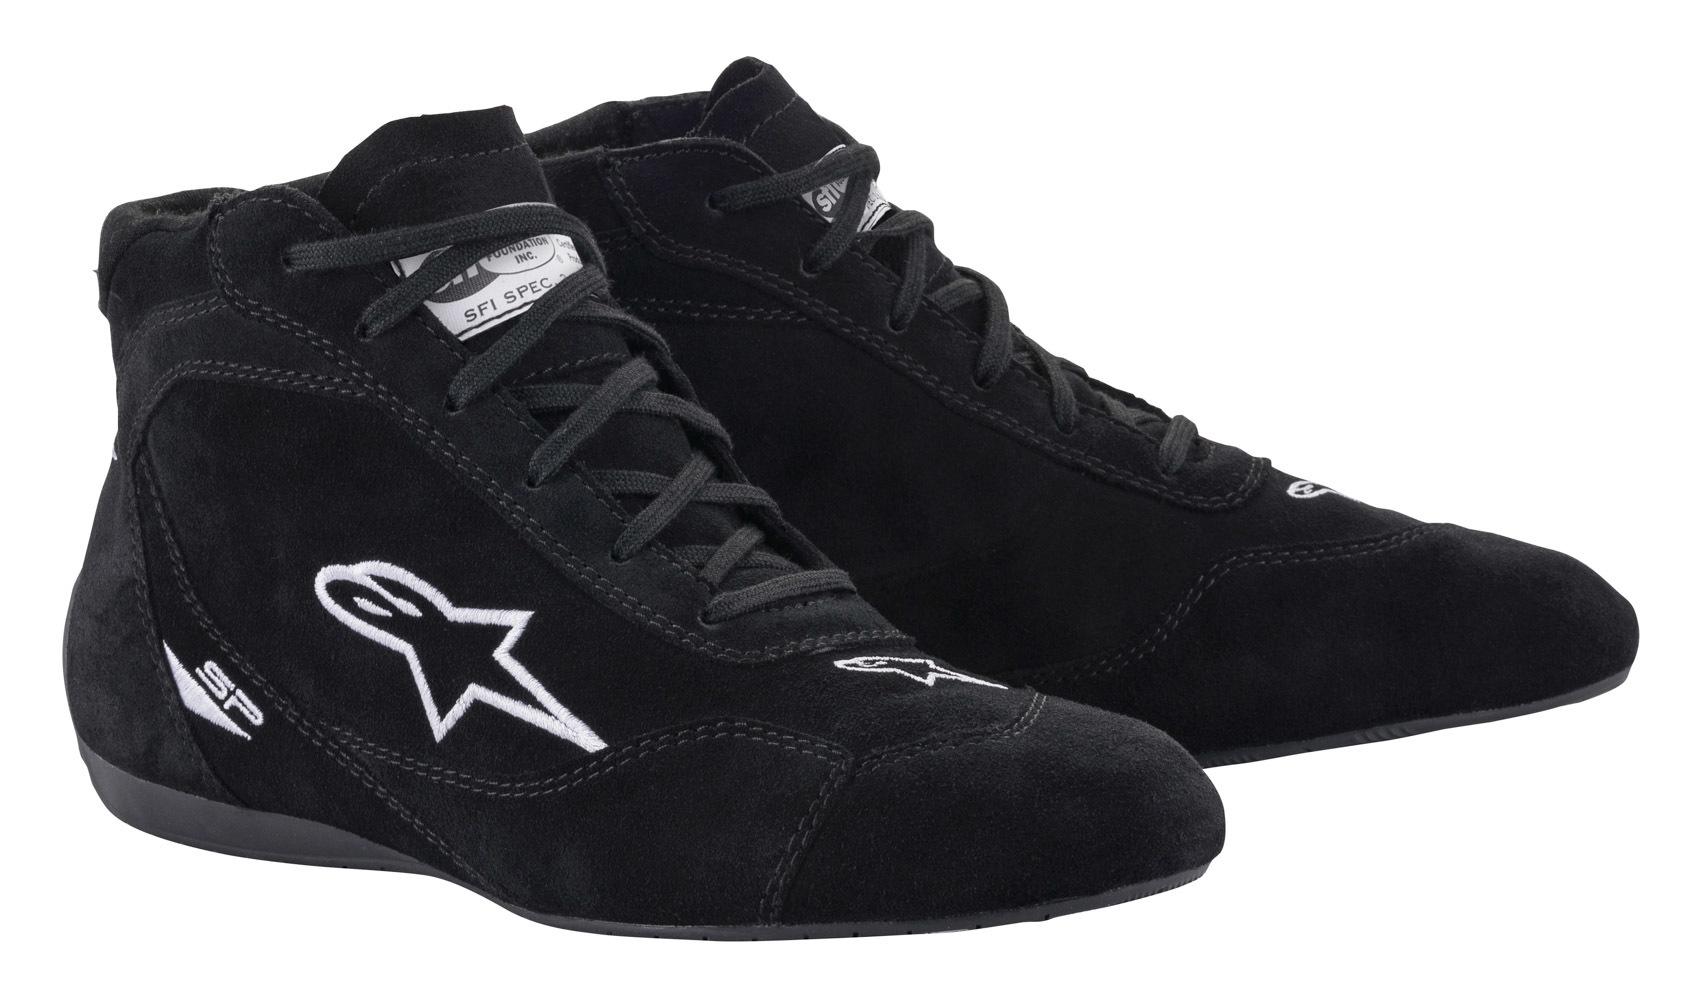 Alpinestars 2710621-10-12 SP V2 Size 12 Driving Shoe Mid-Top Black